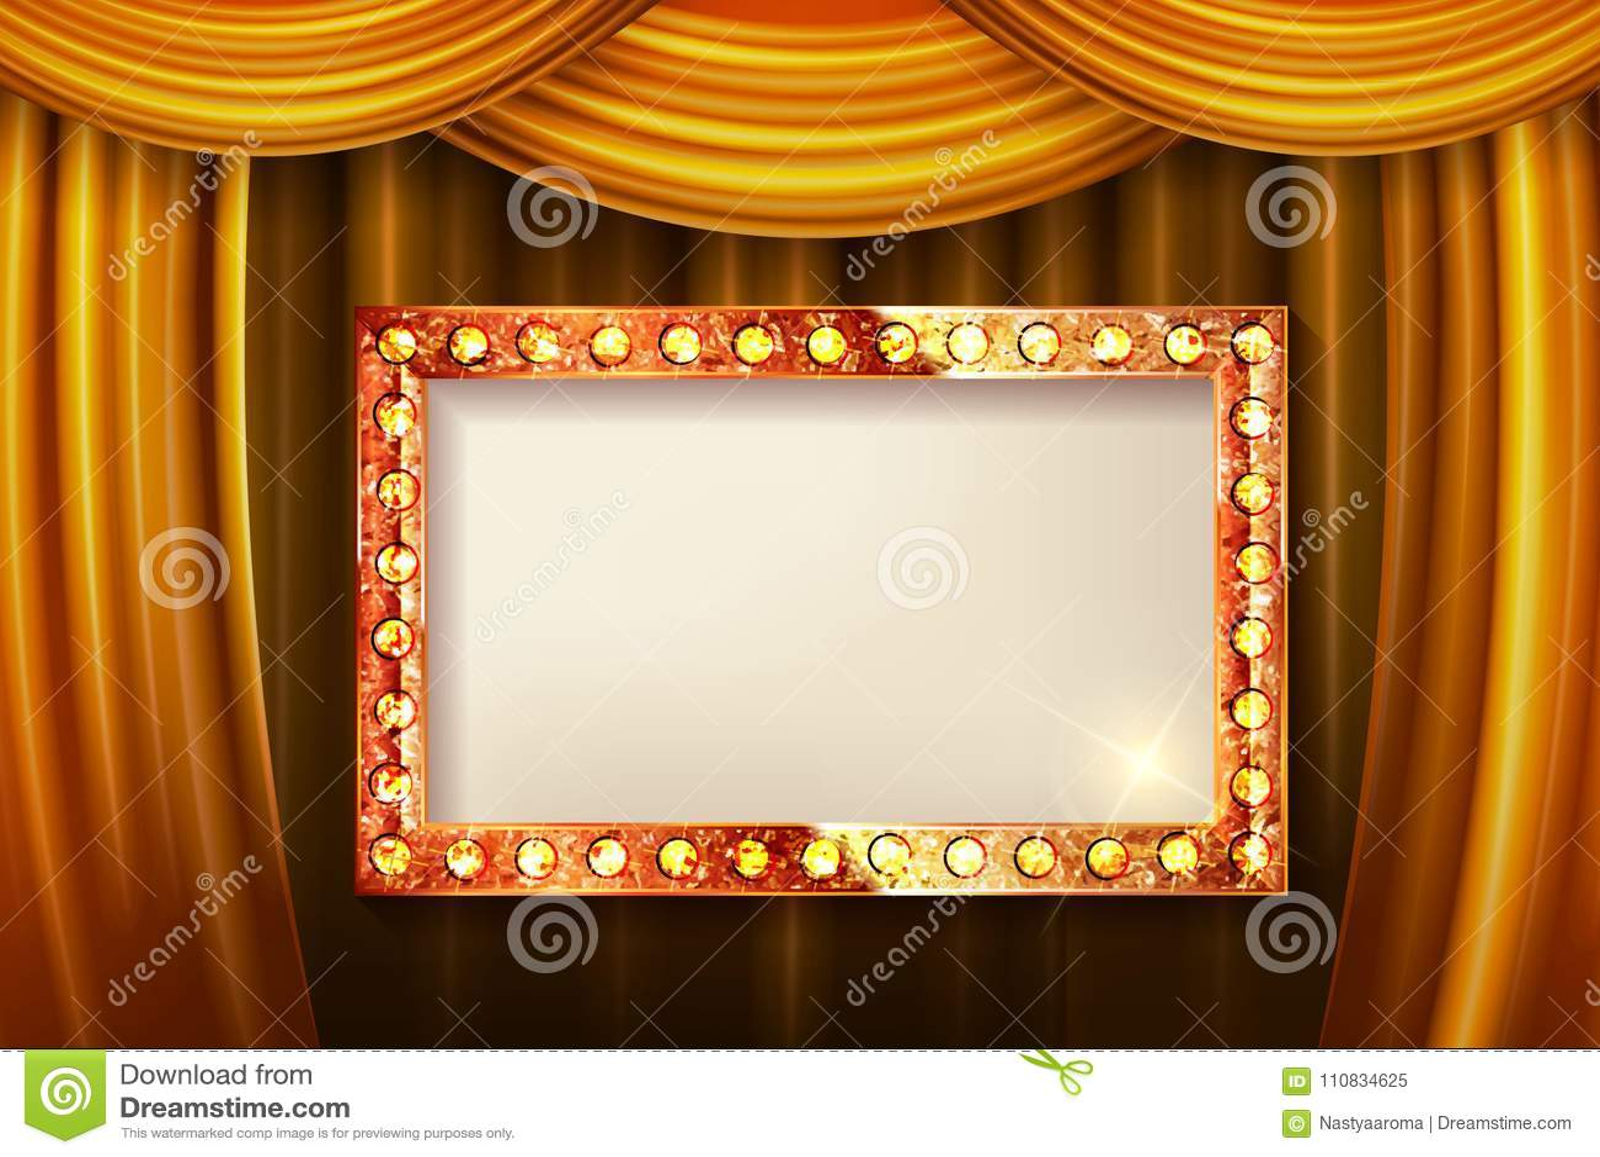 Gold Frame With Light Bulbs Stock Illustration - Illustration of ...